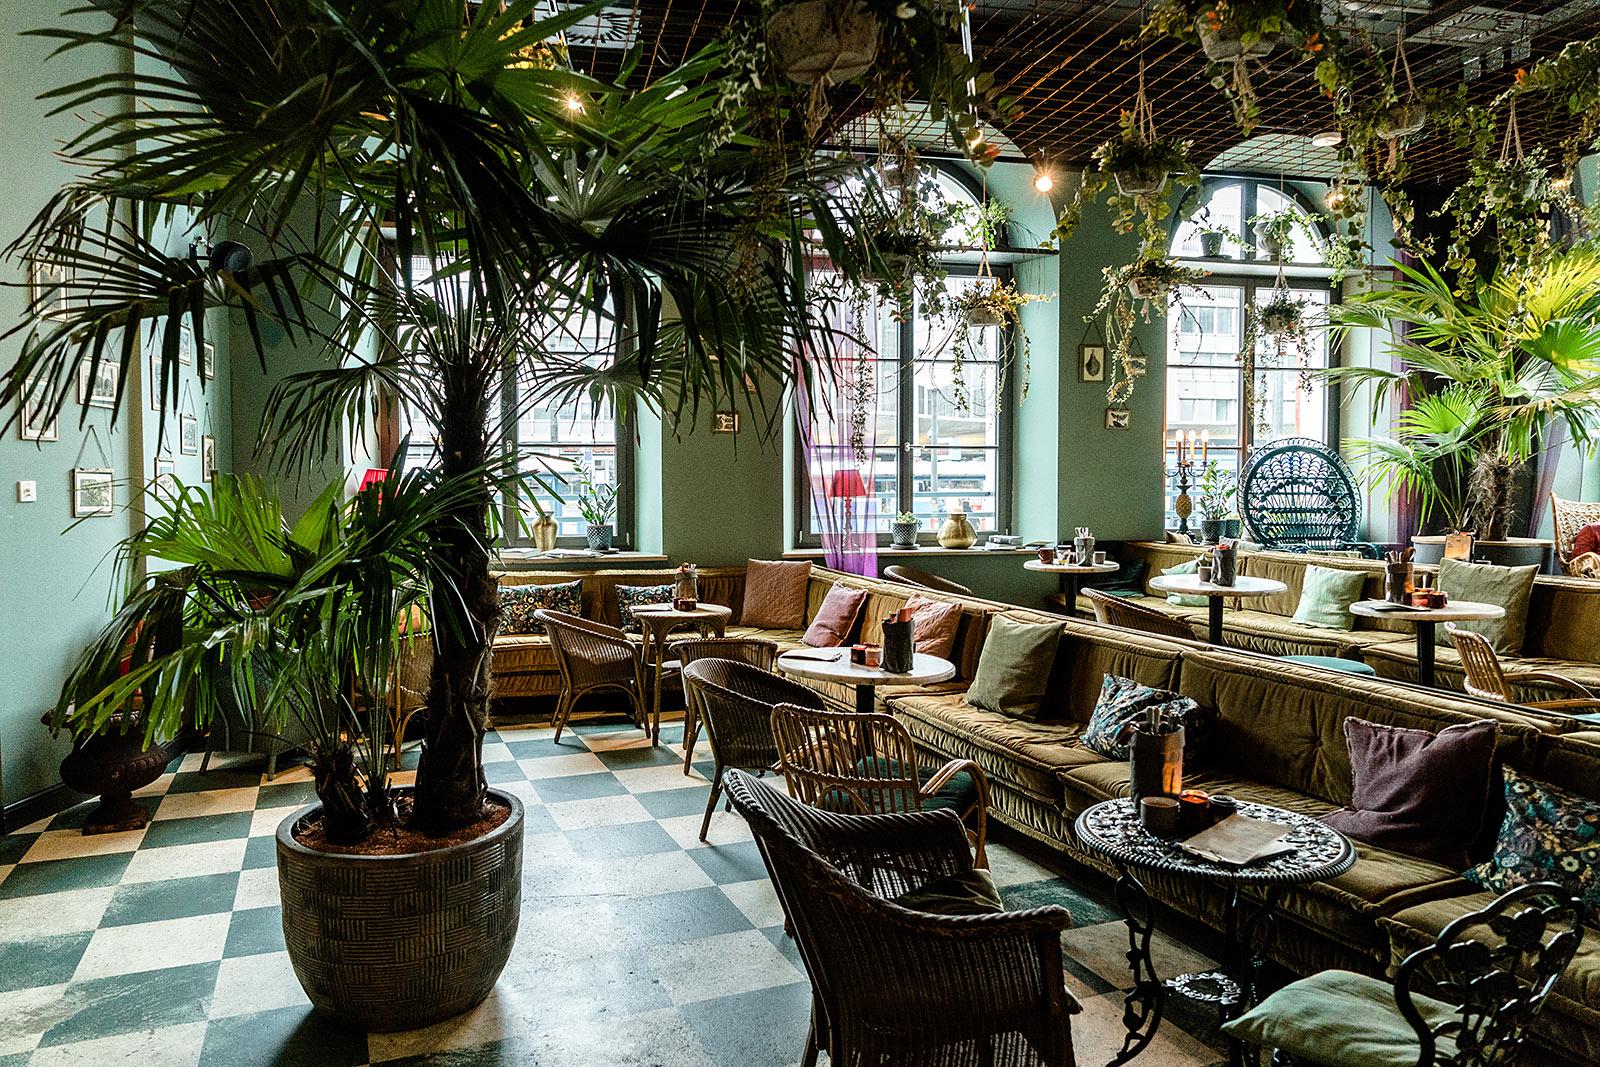 neni israelisches restaurant 25hours hotel münchen the royal bavarian travel blog sunnyinga